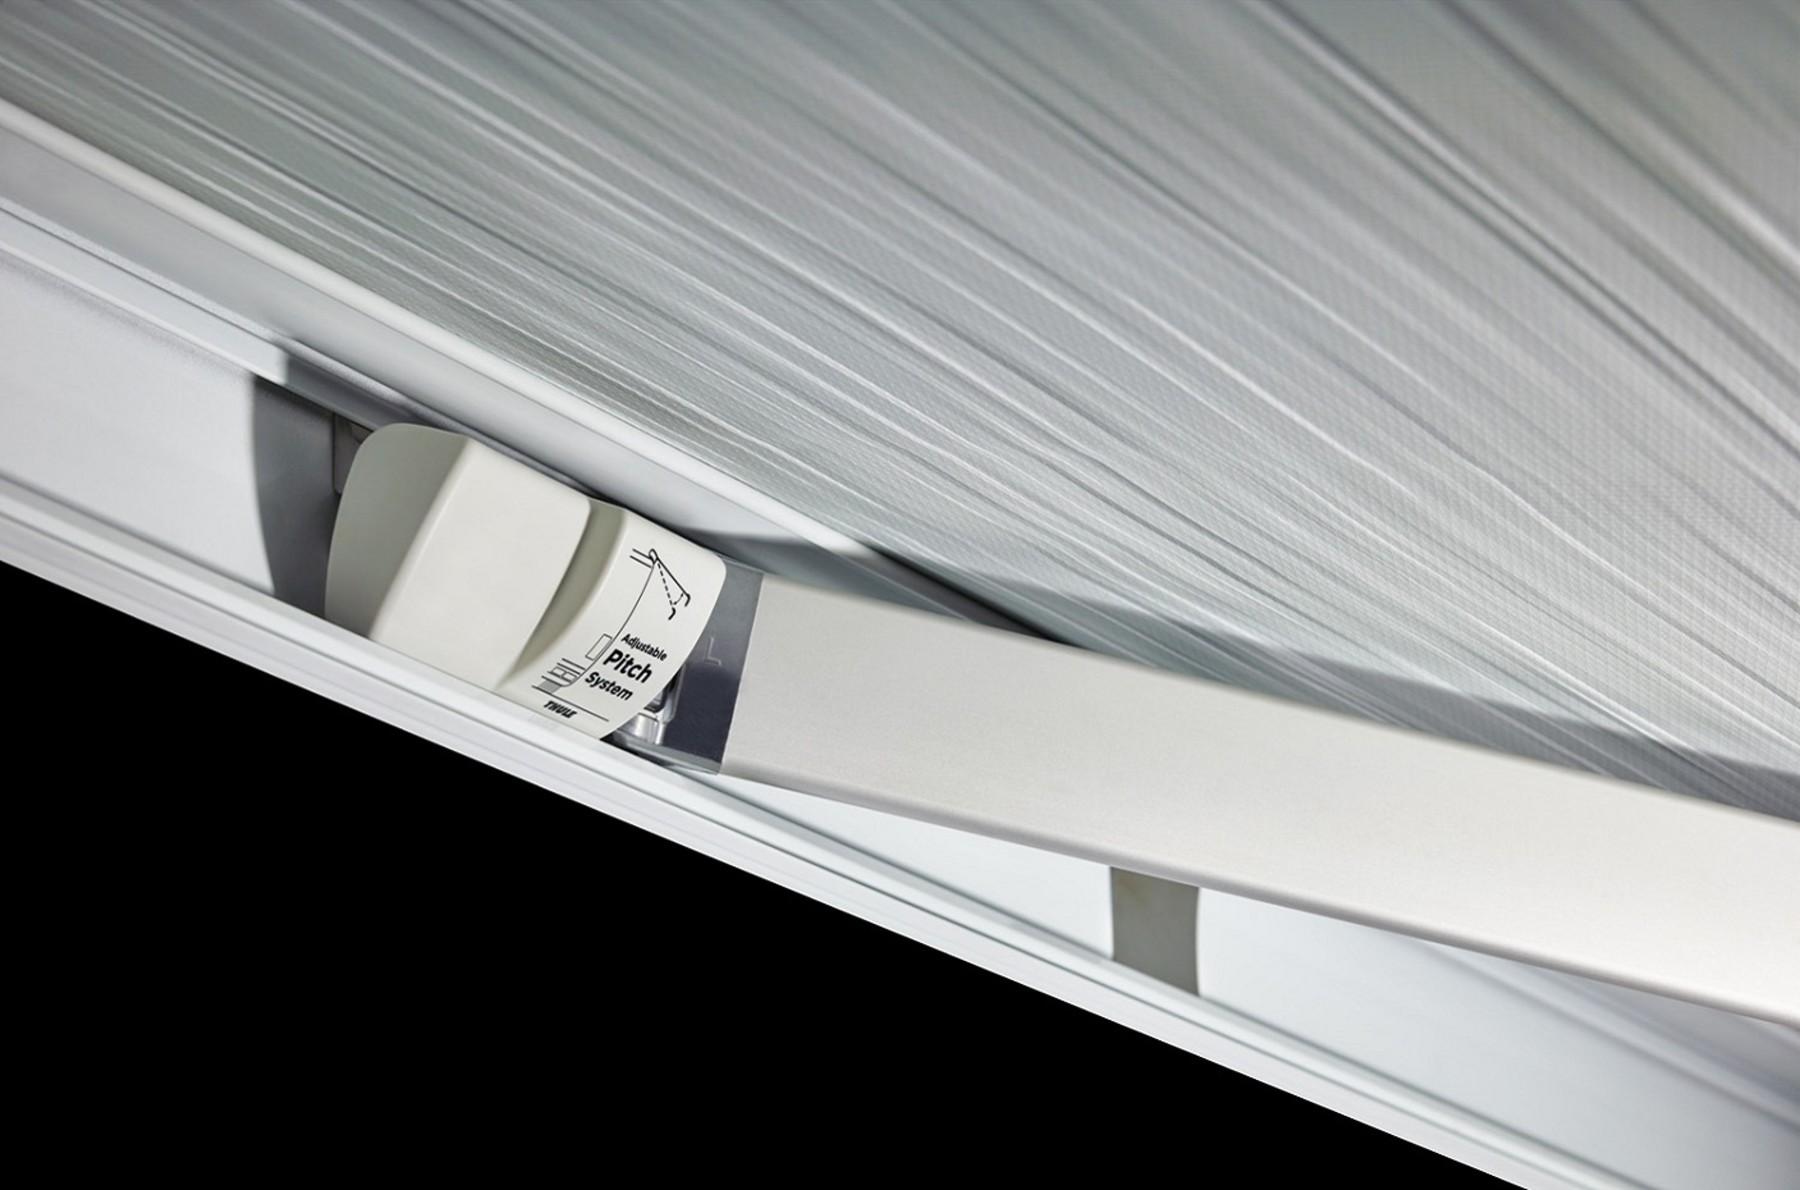 Thule Omnistor 5200 anthrazit 300x250 cm, Mystic Grau